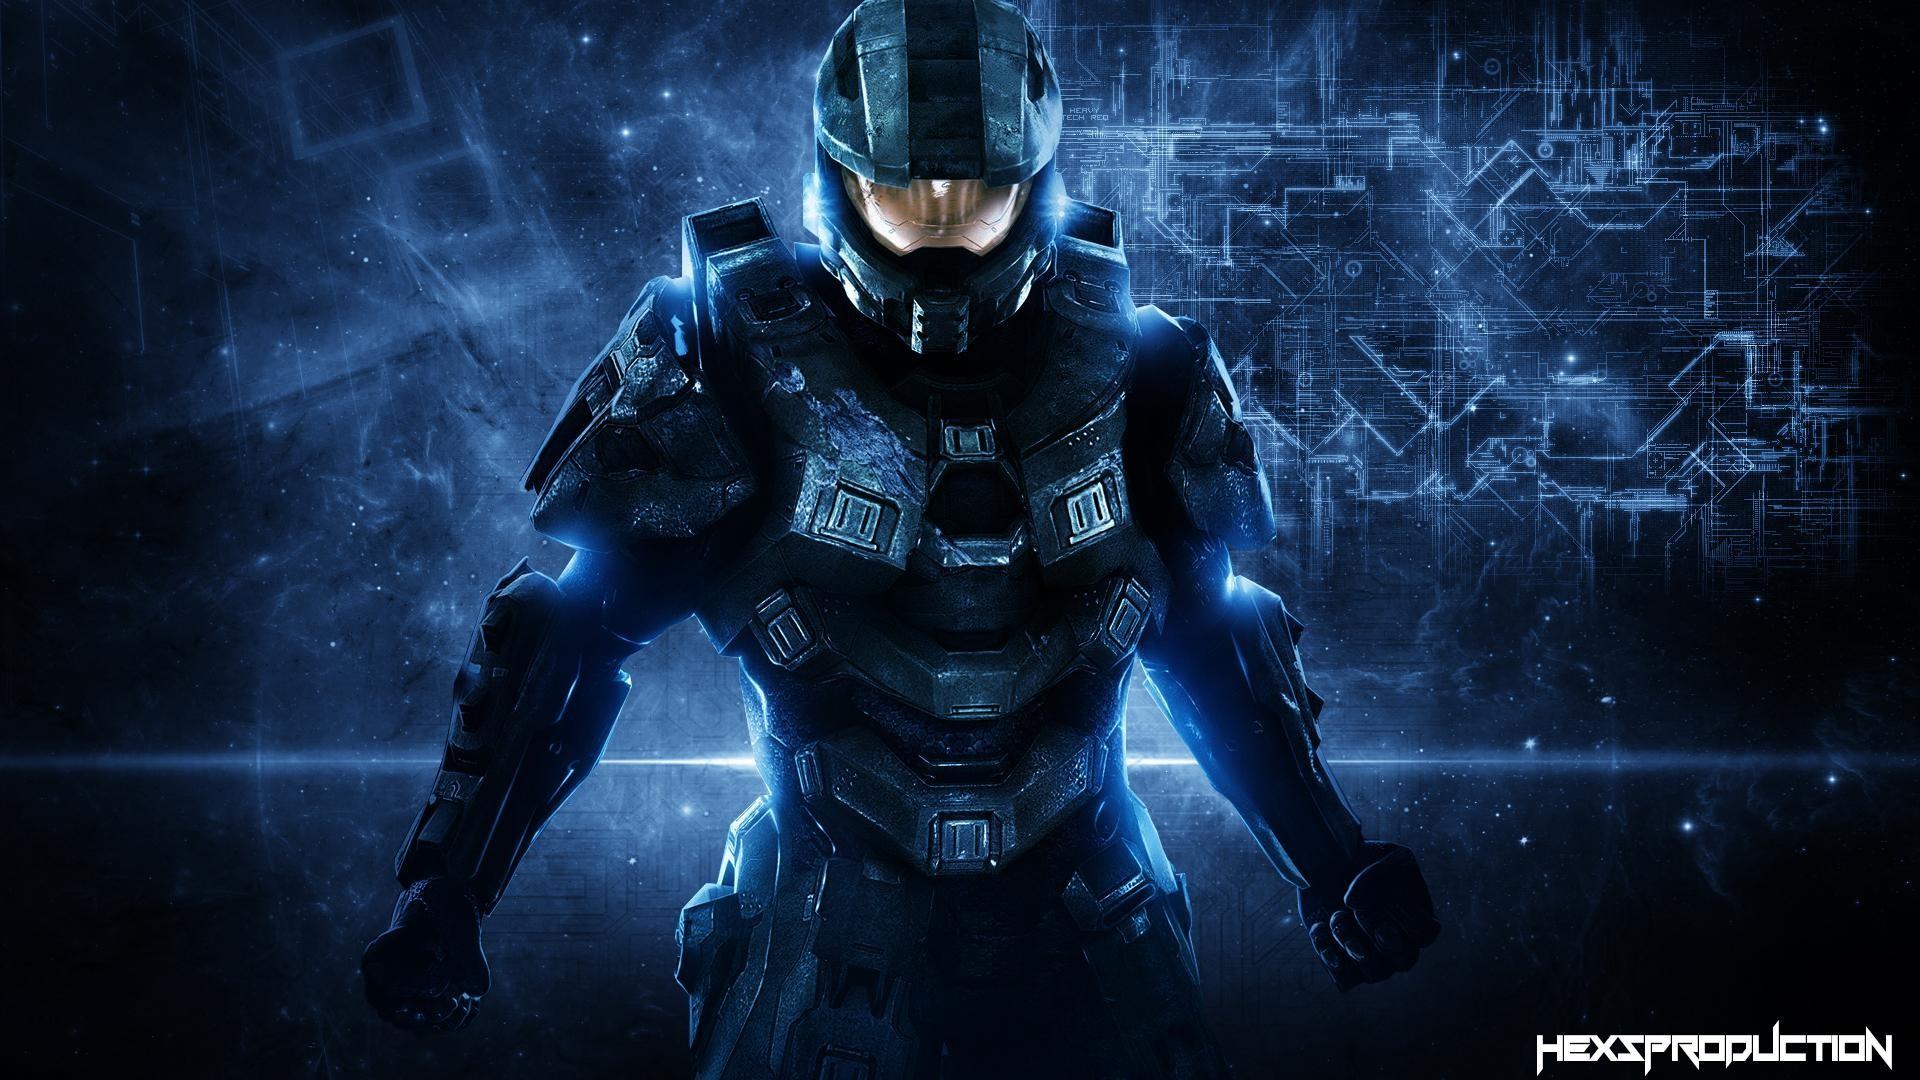 General 1920x1080 Halo Halo 4 Master Chief video games Spartans (Halo)